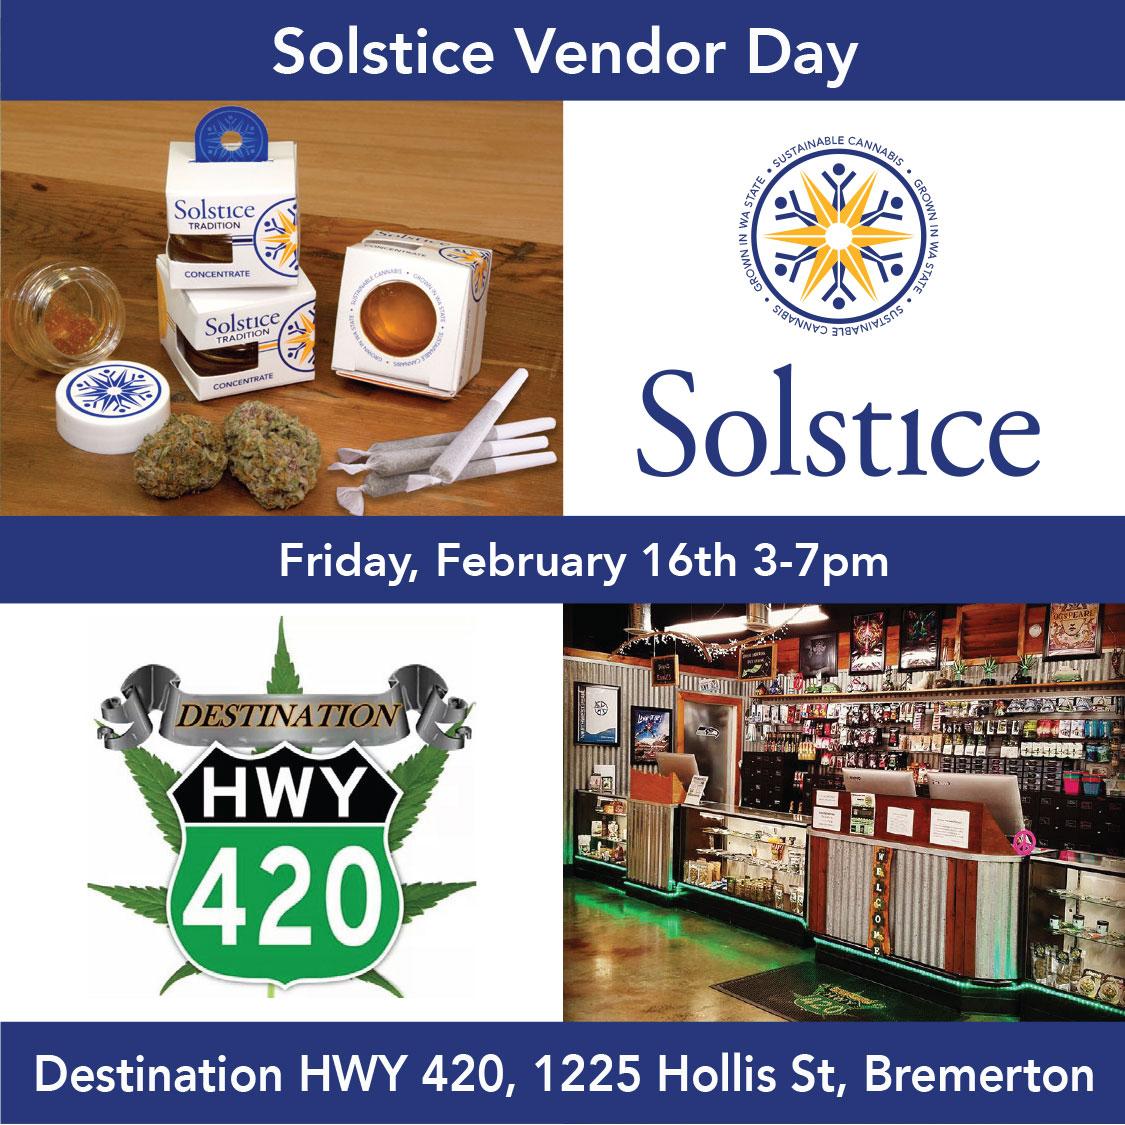 Solstice-Vendor-Day-2.jpg